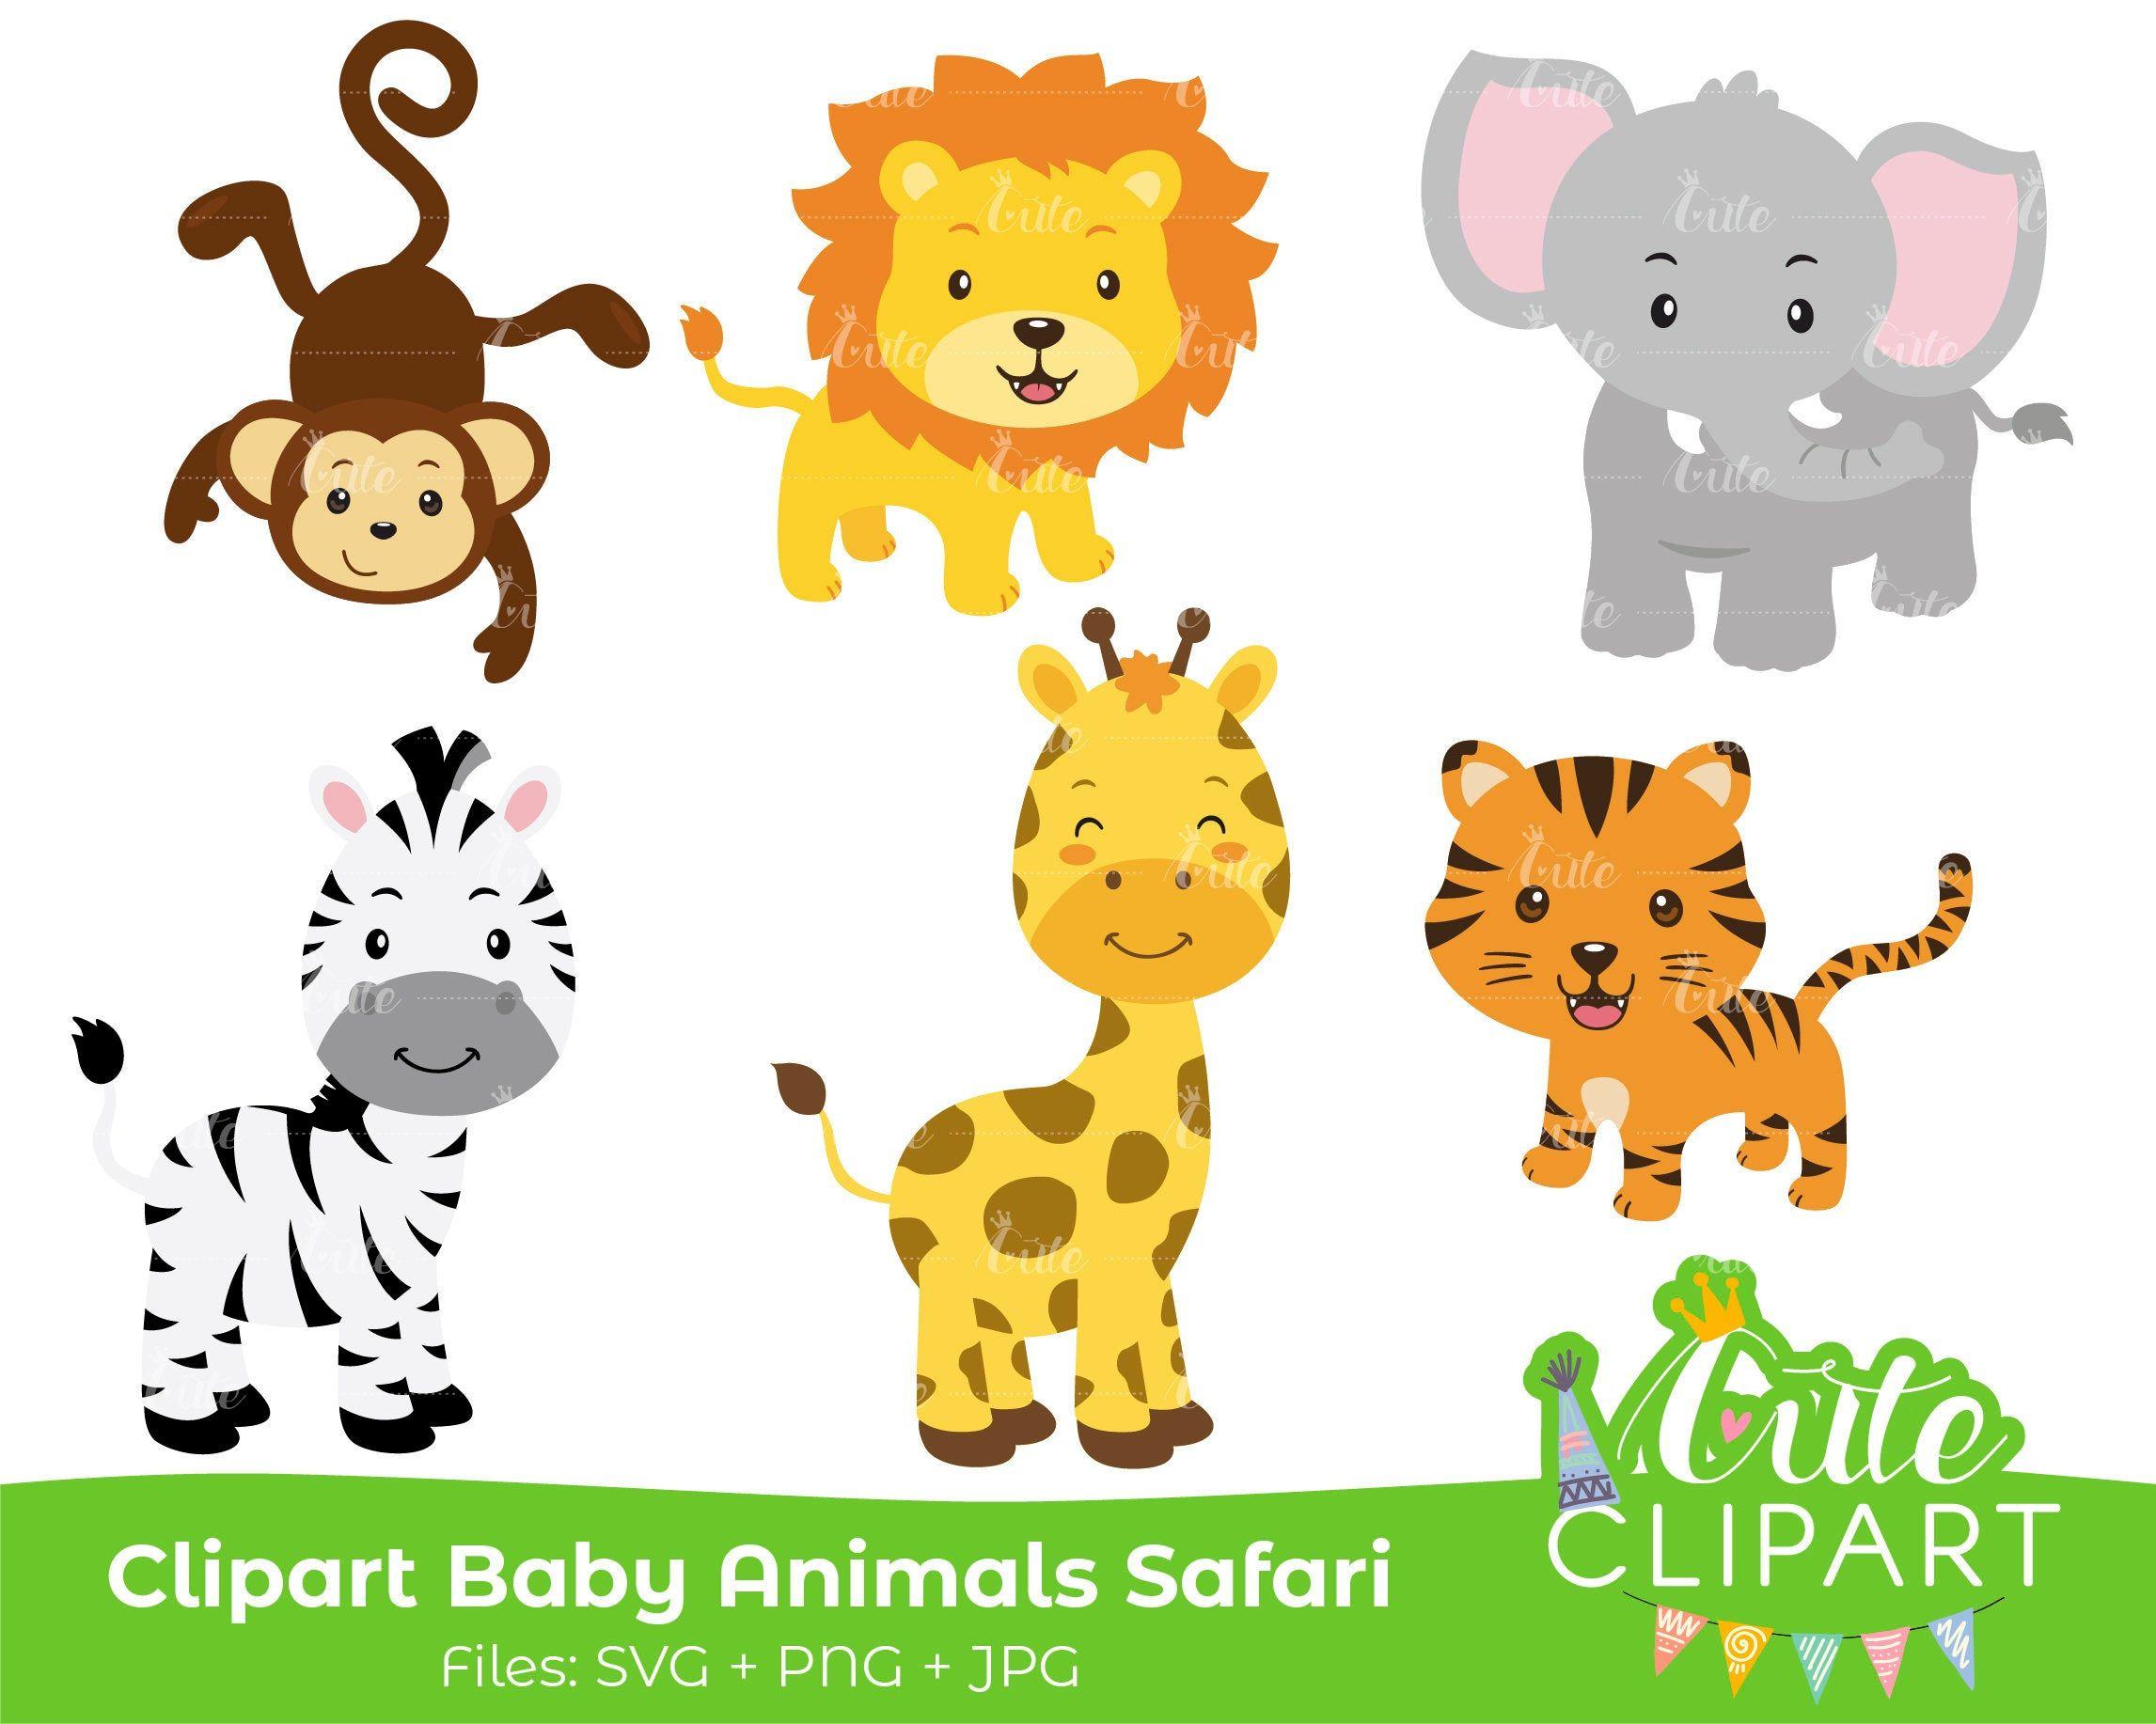 Rainforest Animals Safari Set Clipart Fan Made Version Svg Png Jpg Printables De Cuteclipartsdn En Etsy Safari Baby Animals Baby Animals Safari